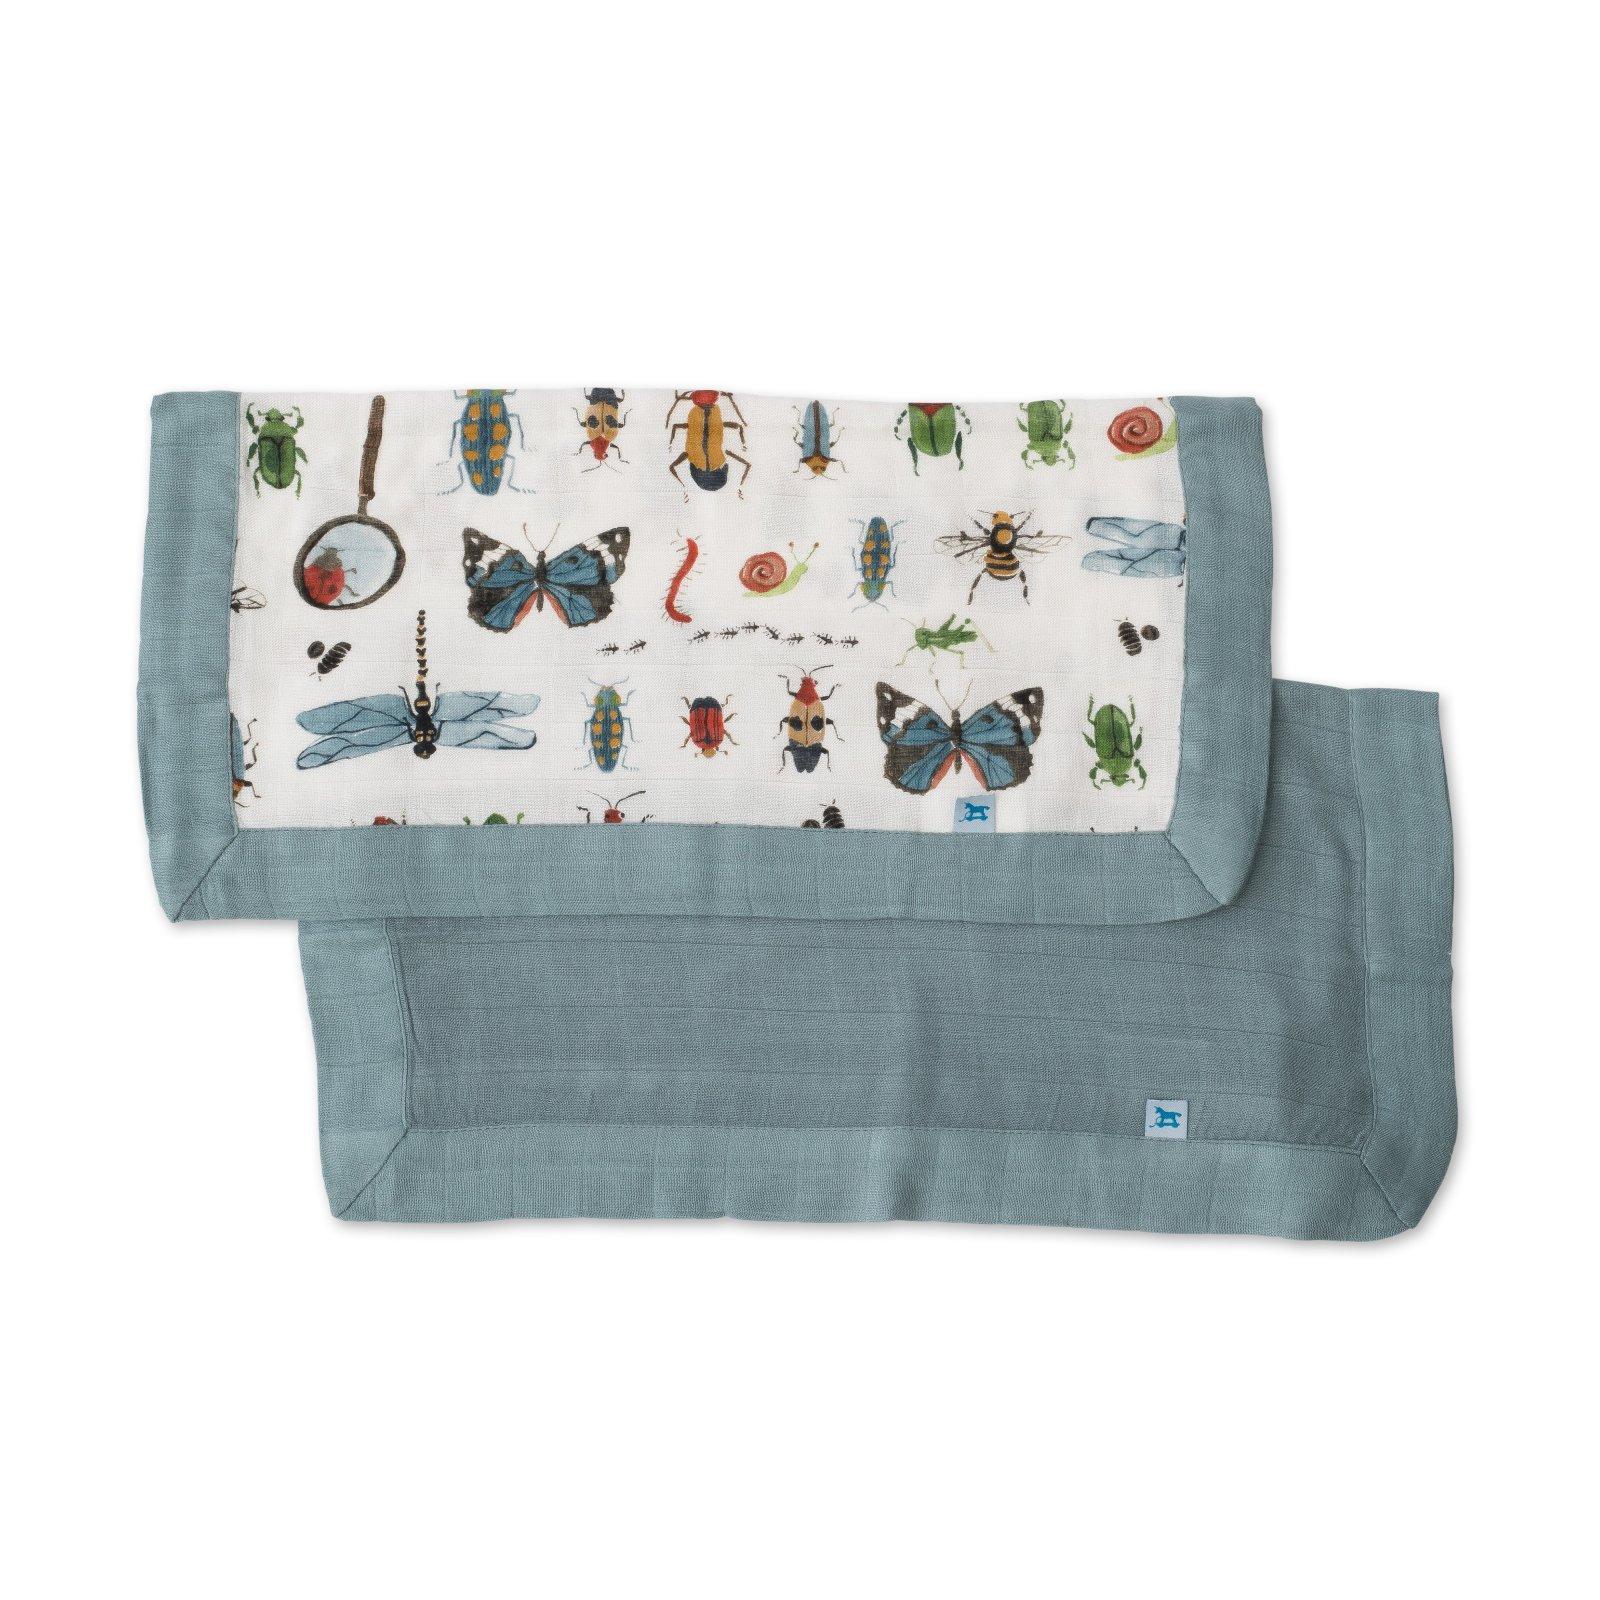 Little Unicorn Deluxe Muslin Security Blanket 2 Pack - Bugs + Spruce